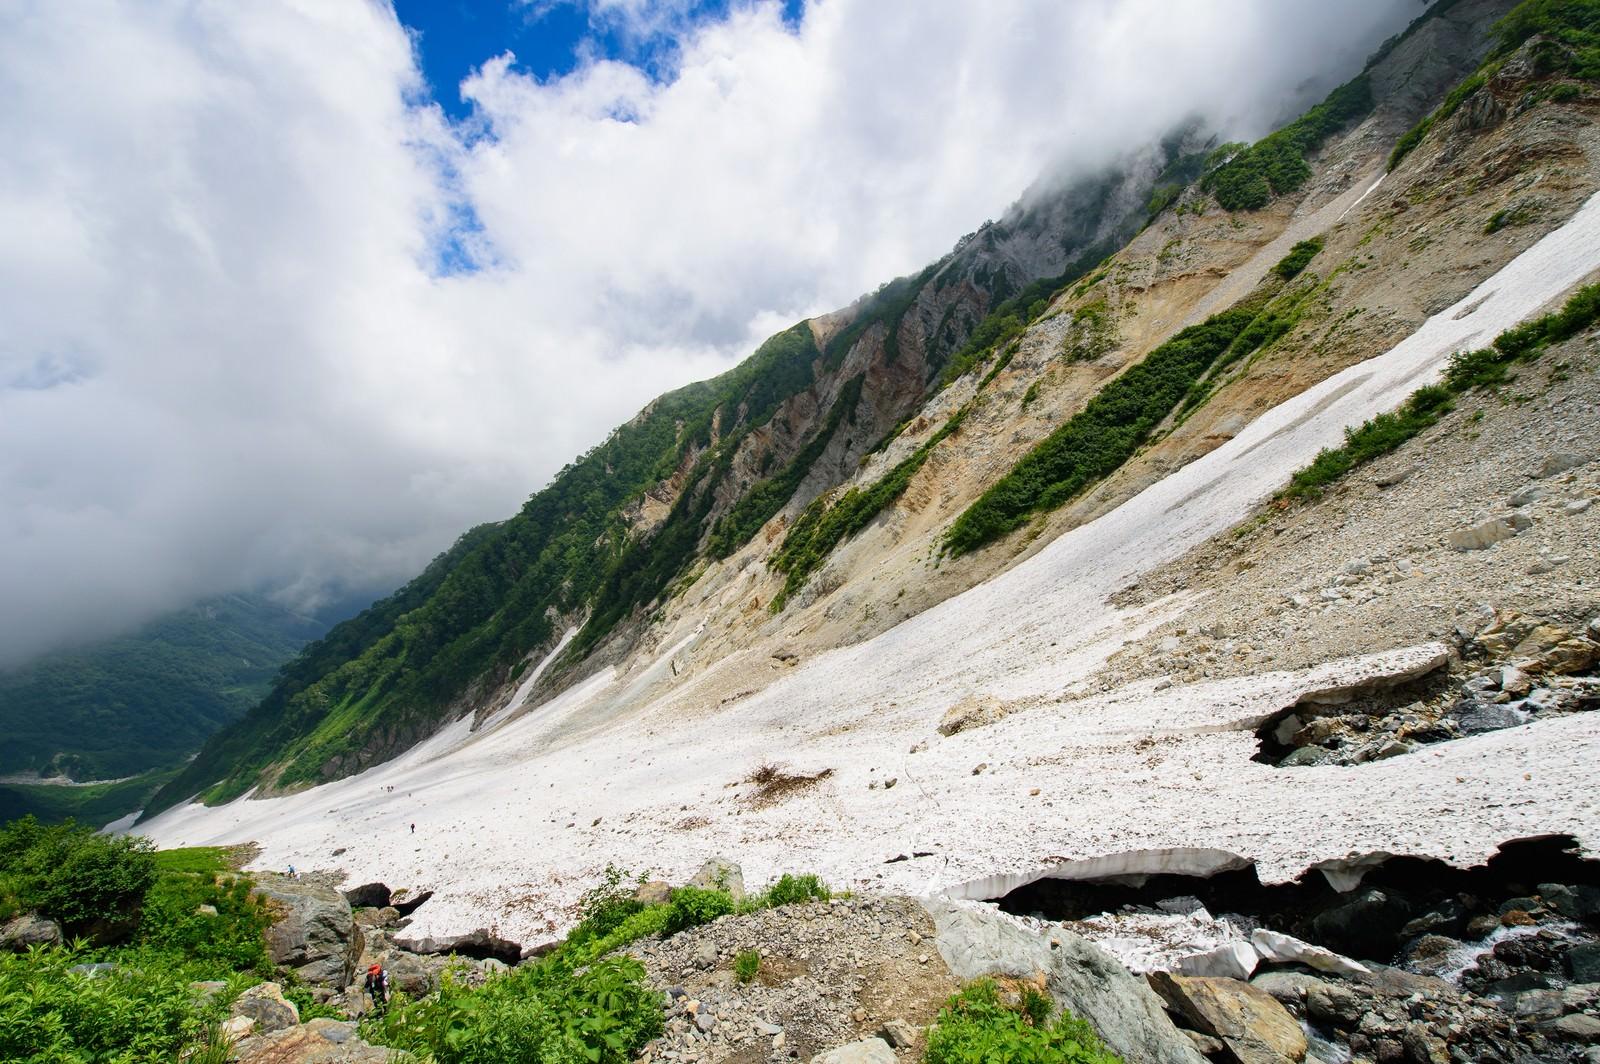 「白馬大雪渓の傾斜(白馬岳)」の写真